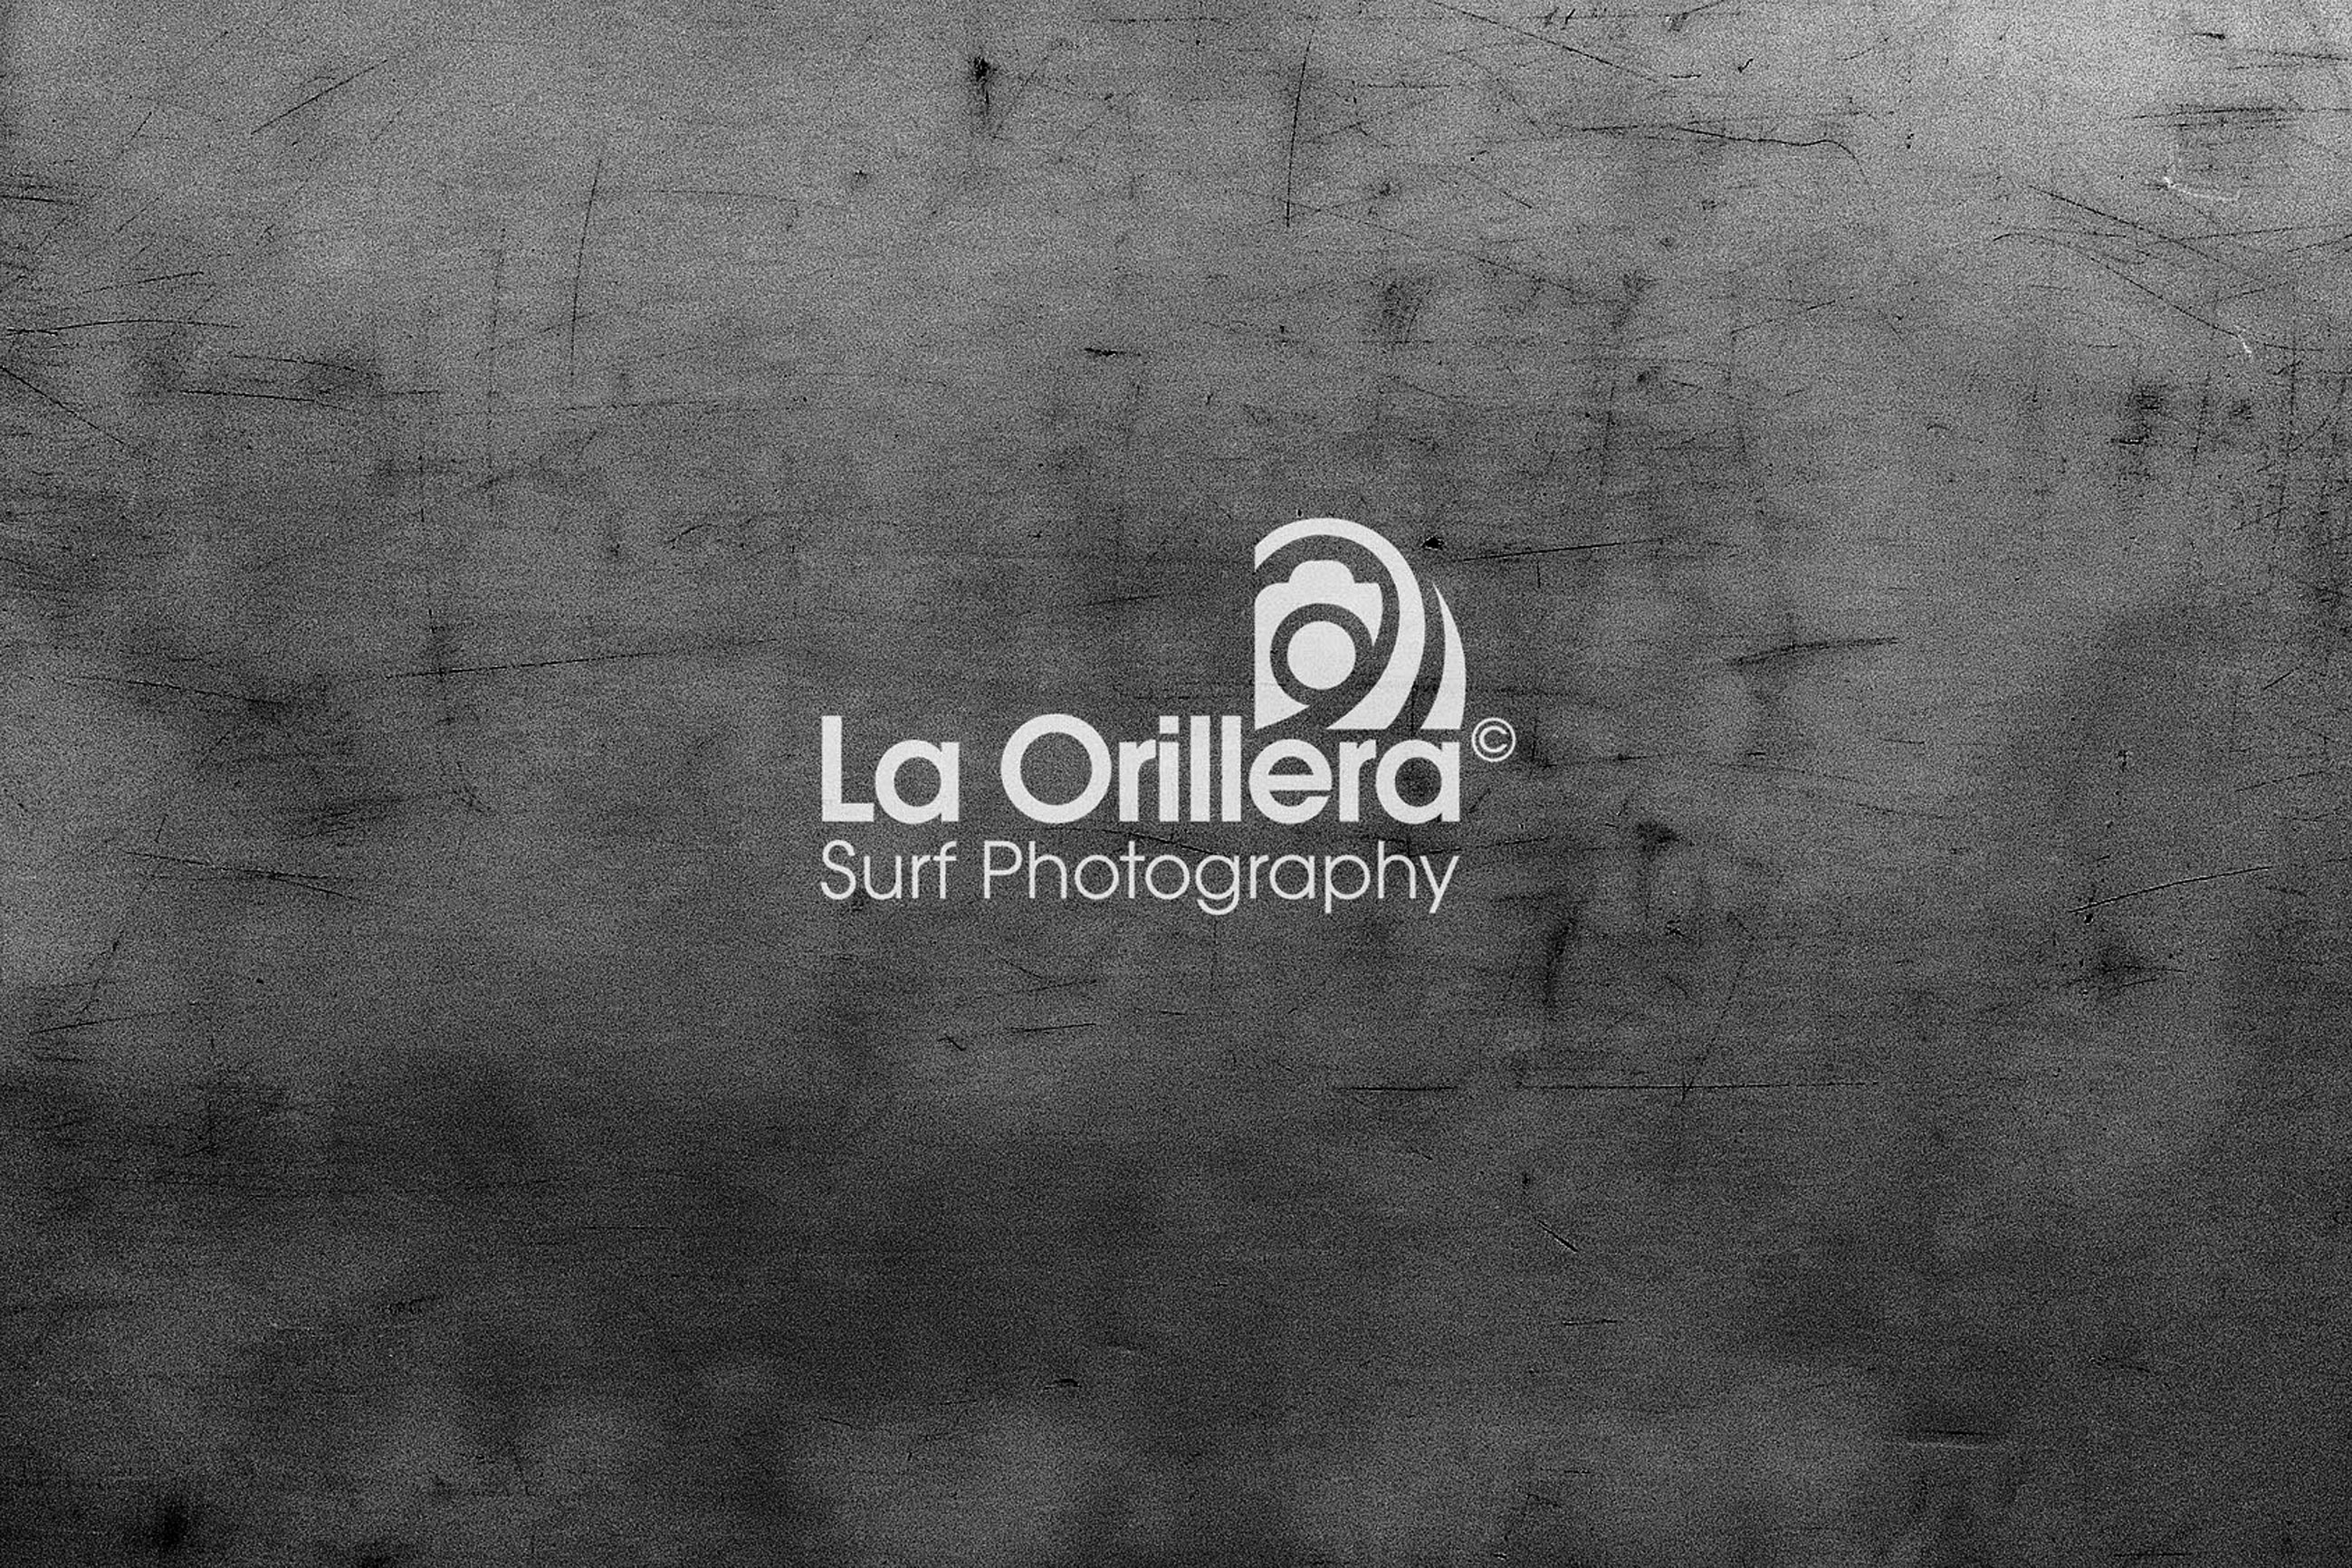 LOGO ORILLERA BLACK